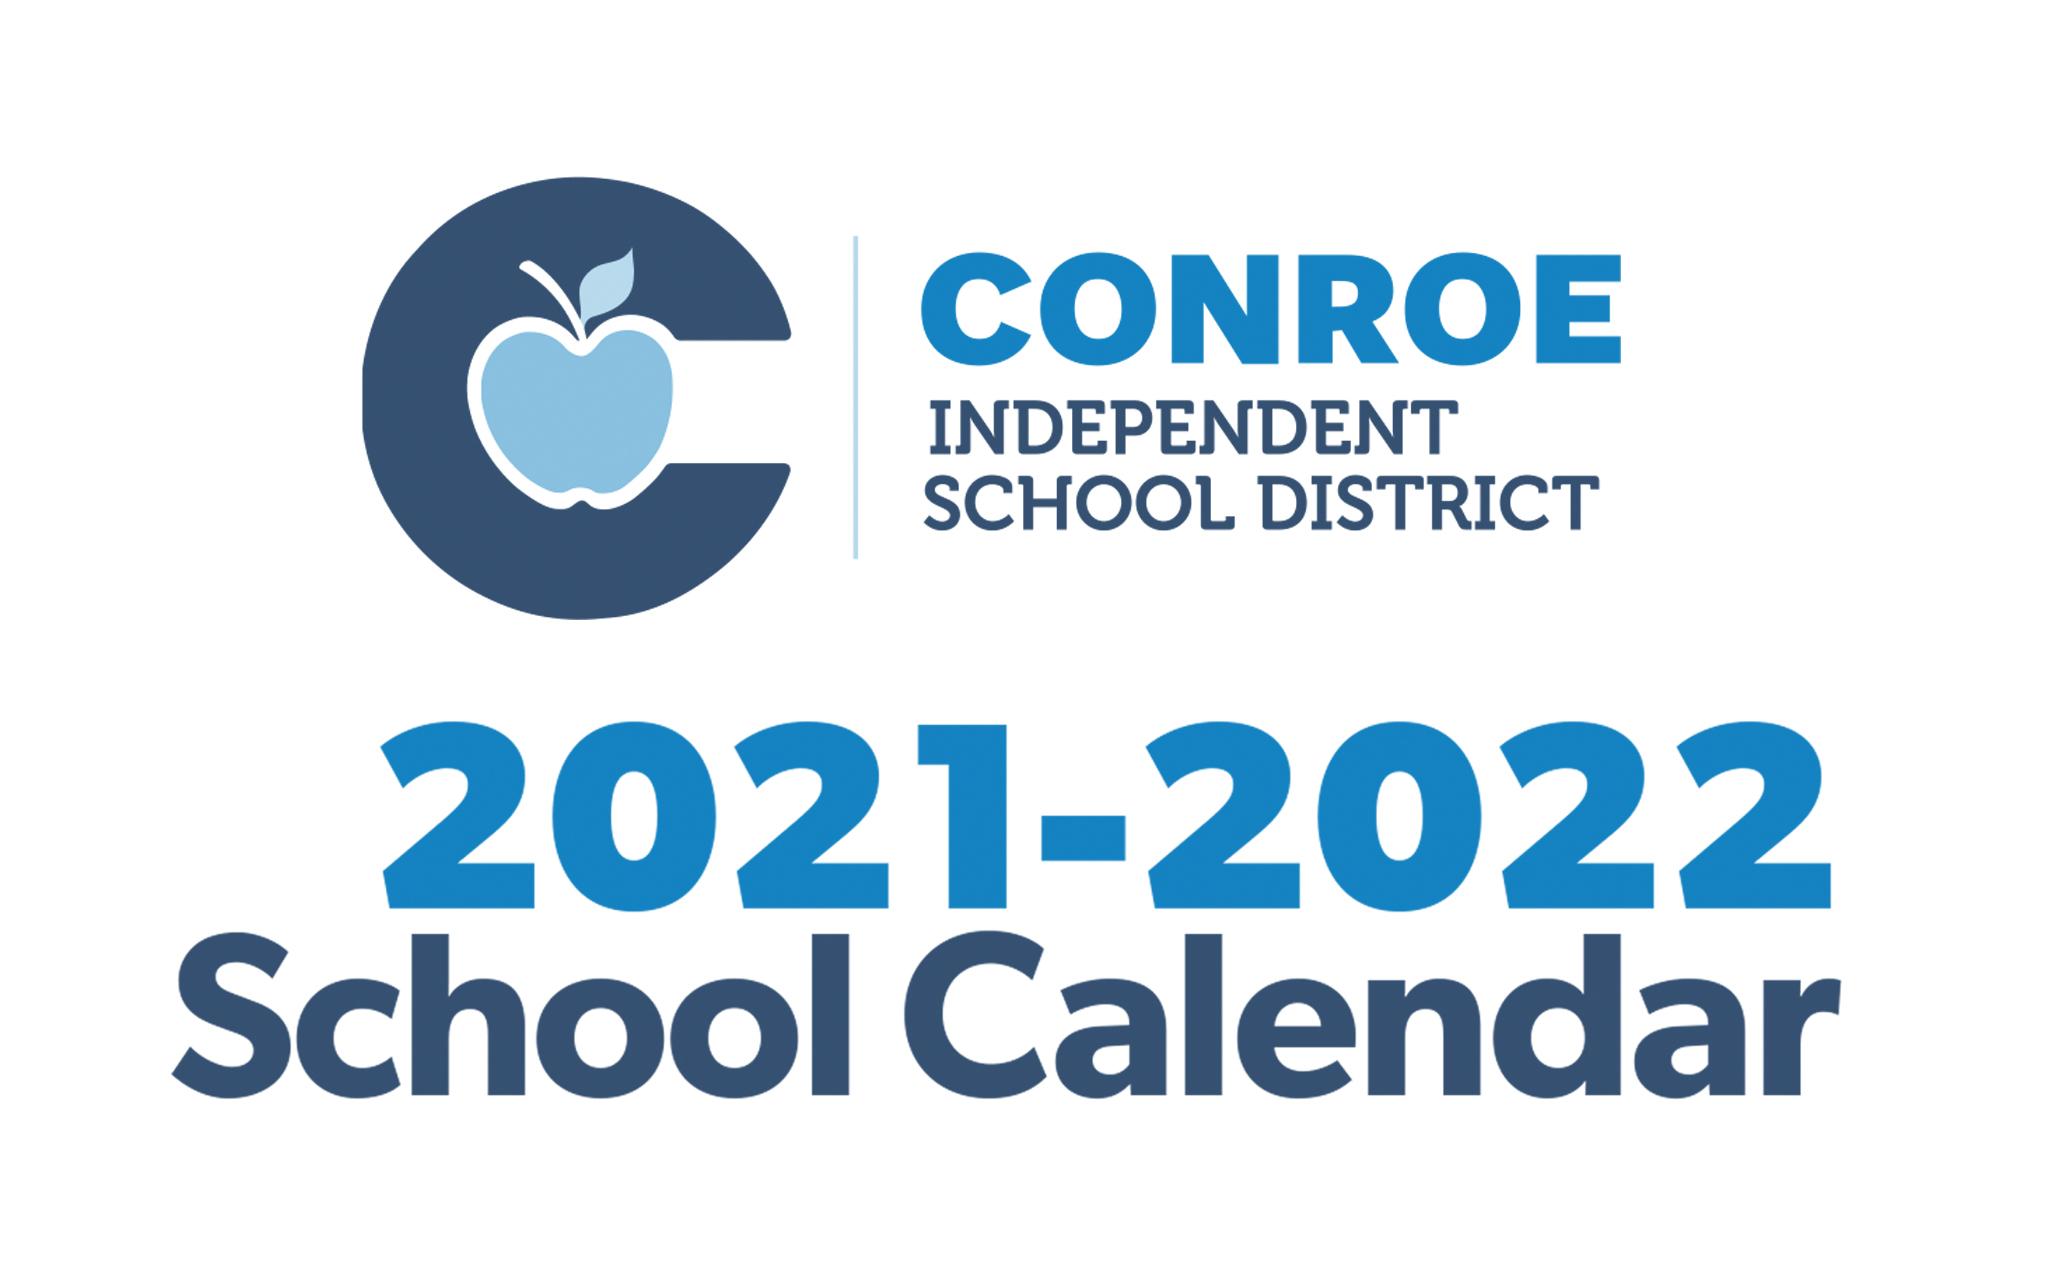 Conroe Isd Calendar 2022.Conroe Isd Trustees Approve 21 22 School Calendar Hello Woodlands